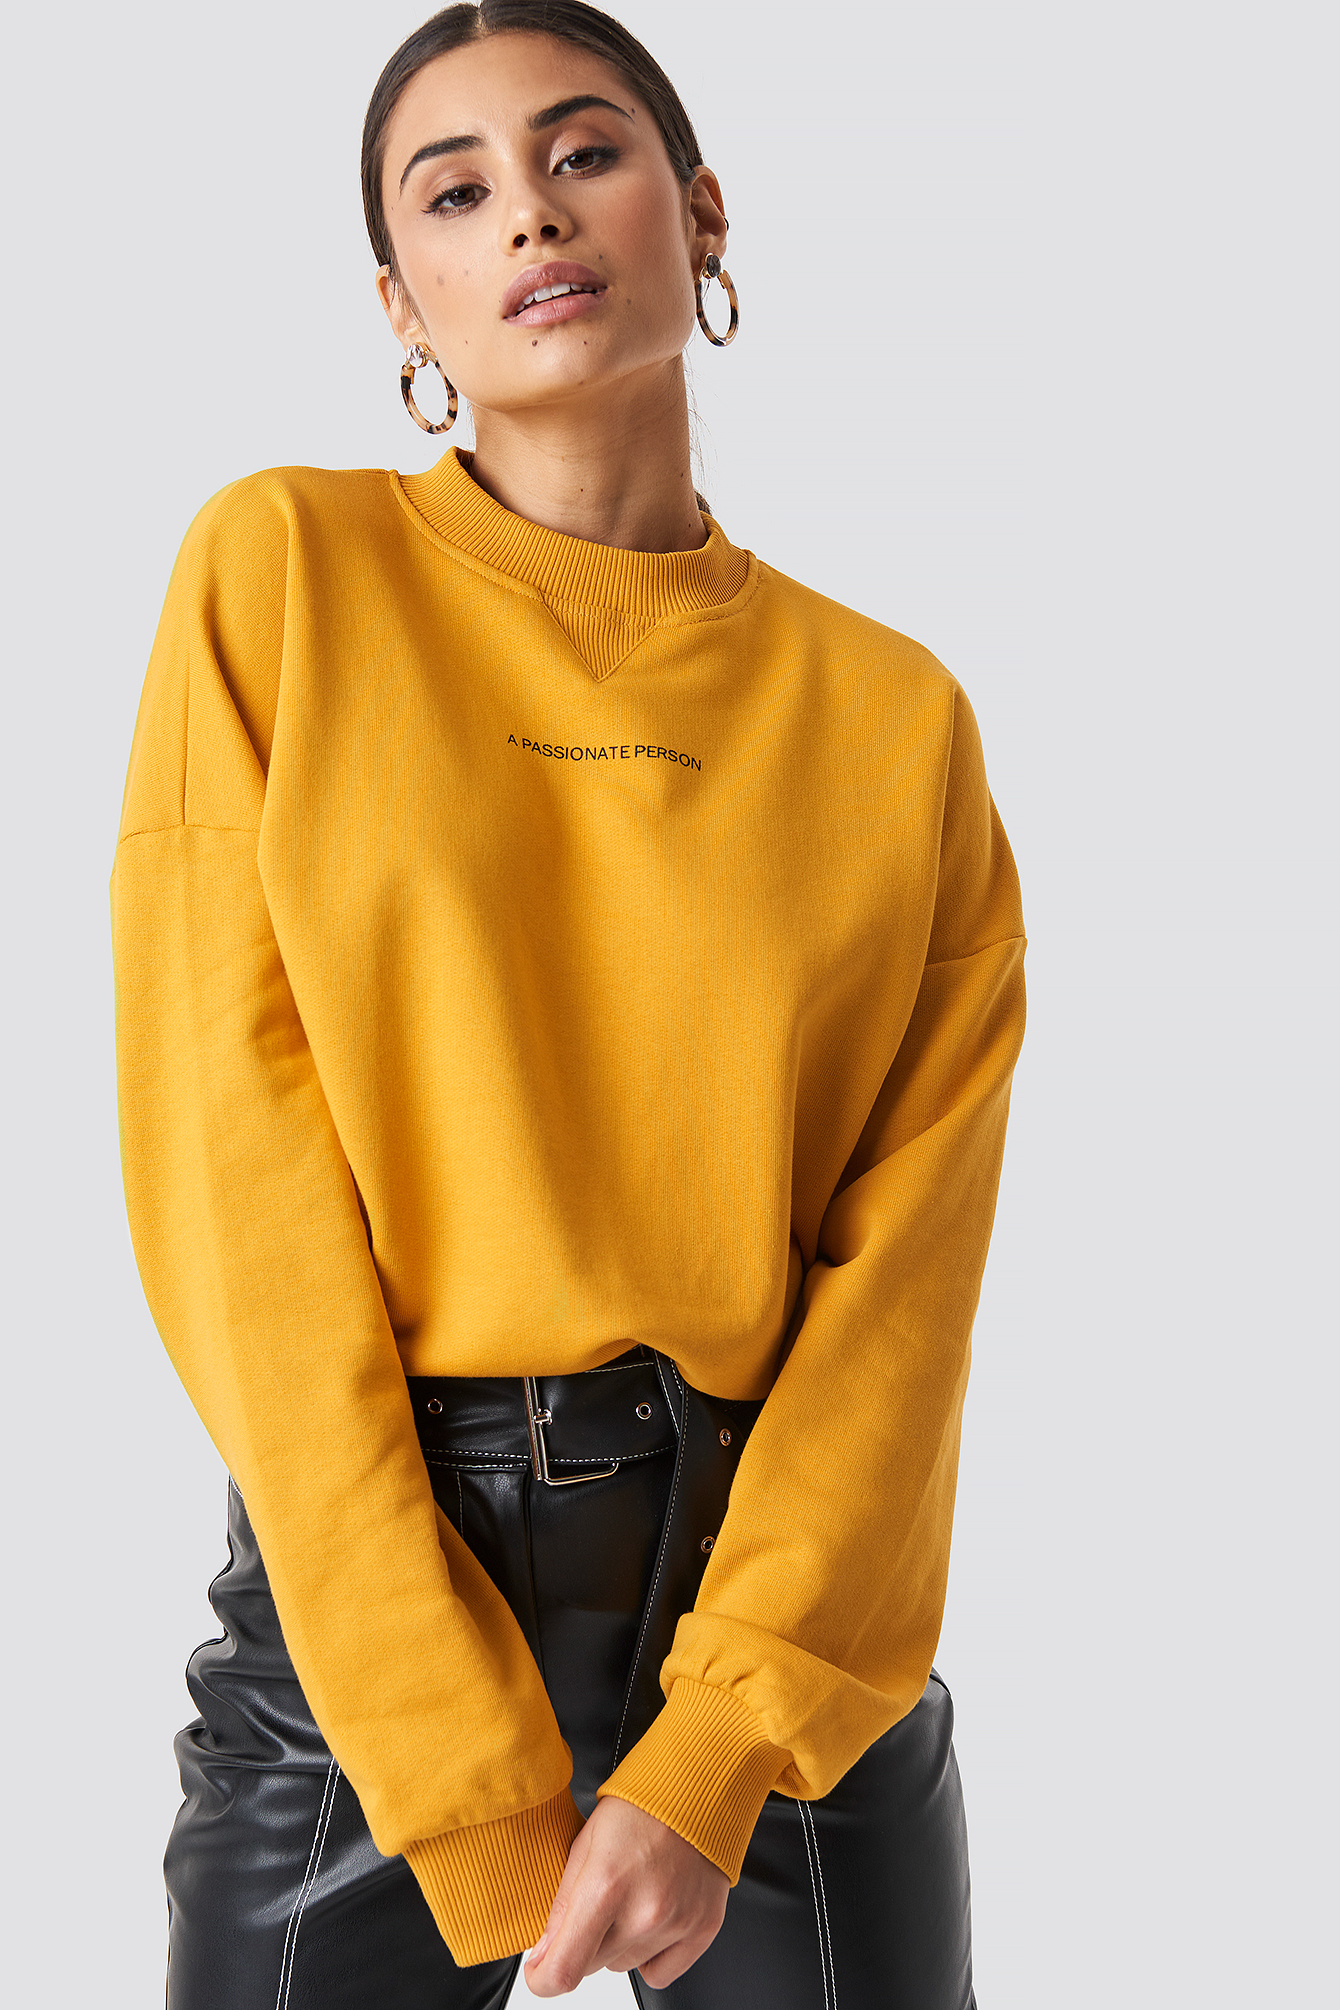 na-kd trend -  Passionate Sweatshirt - Orange,Yellow